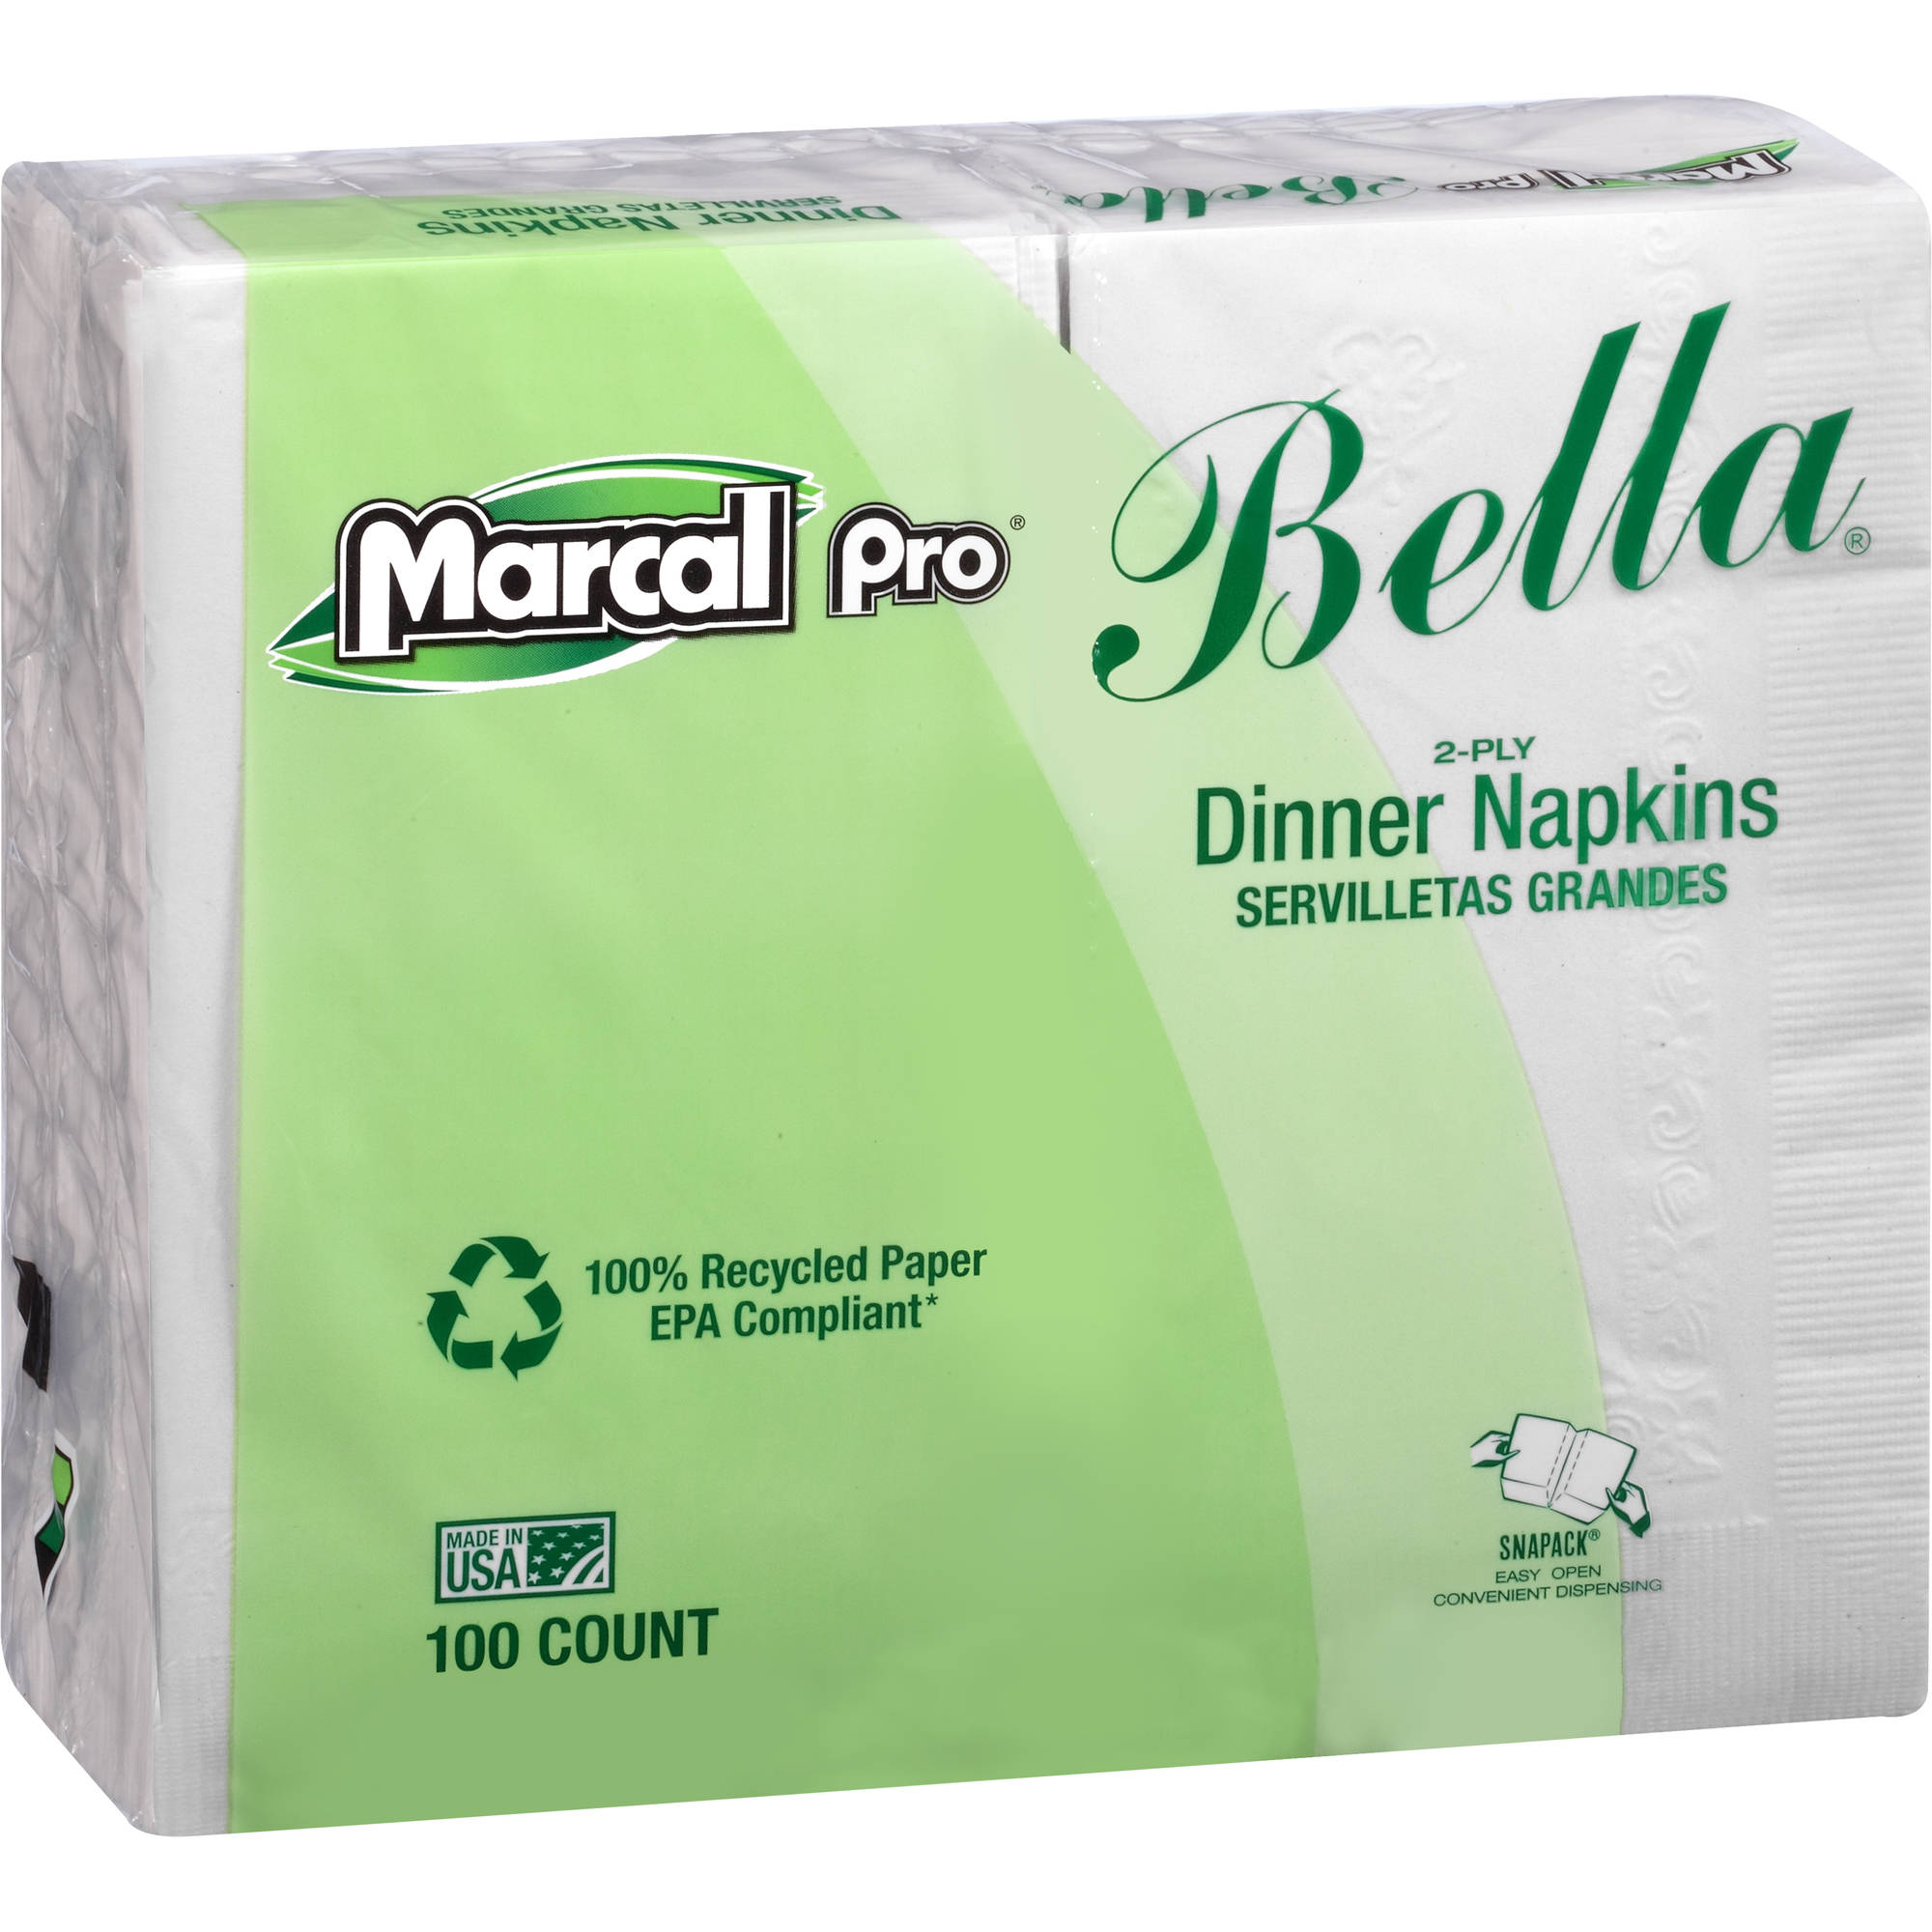 Marcal Eminence Bella 2-Ply Dinner Napkins, 30 Packs of 100, 3000 Total